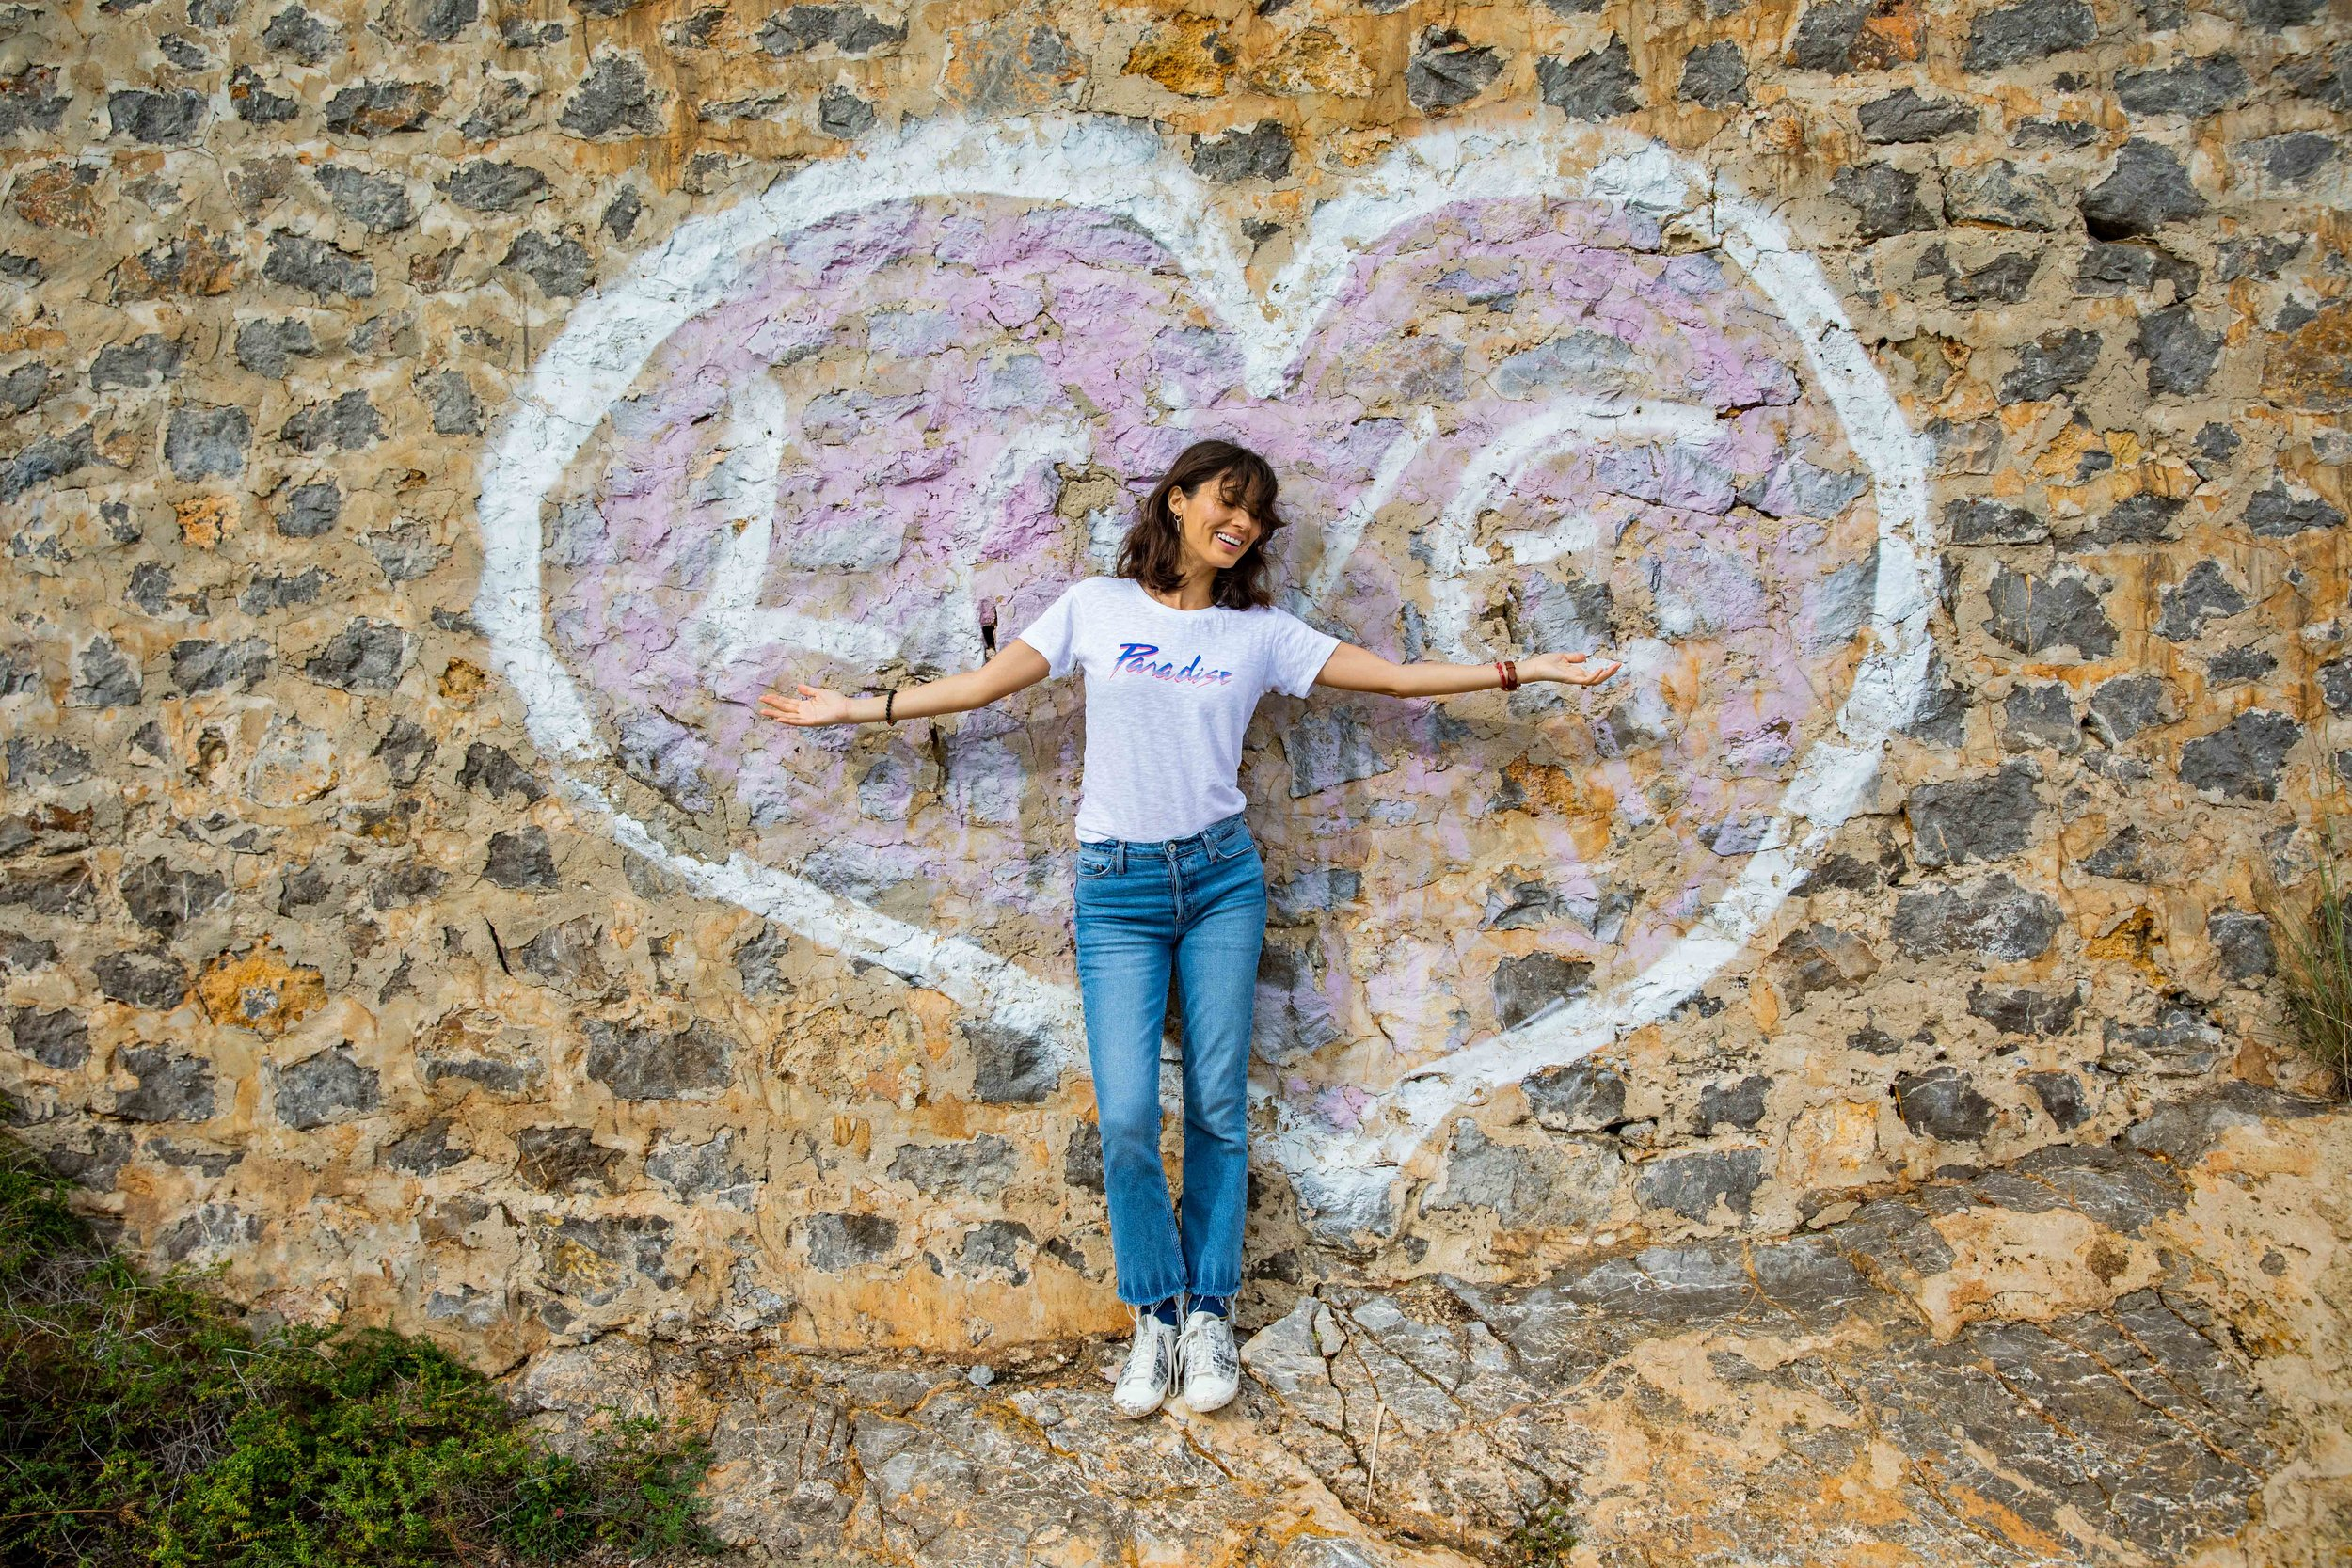 JasmineHemsley_Ibiza_NickHopperPhotography-1555.jpg